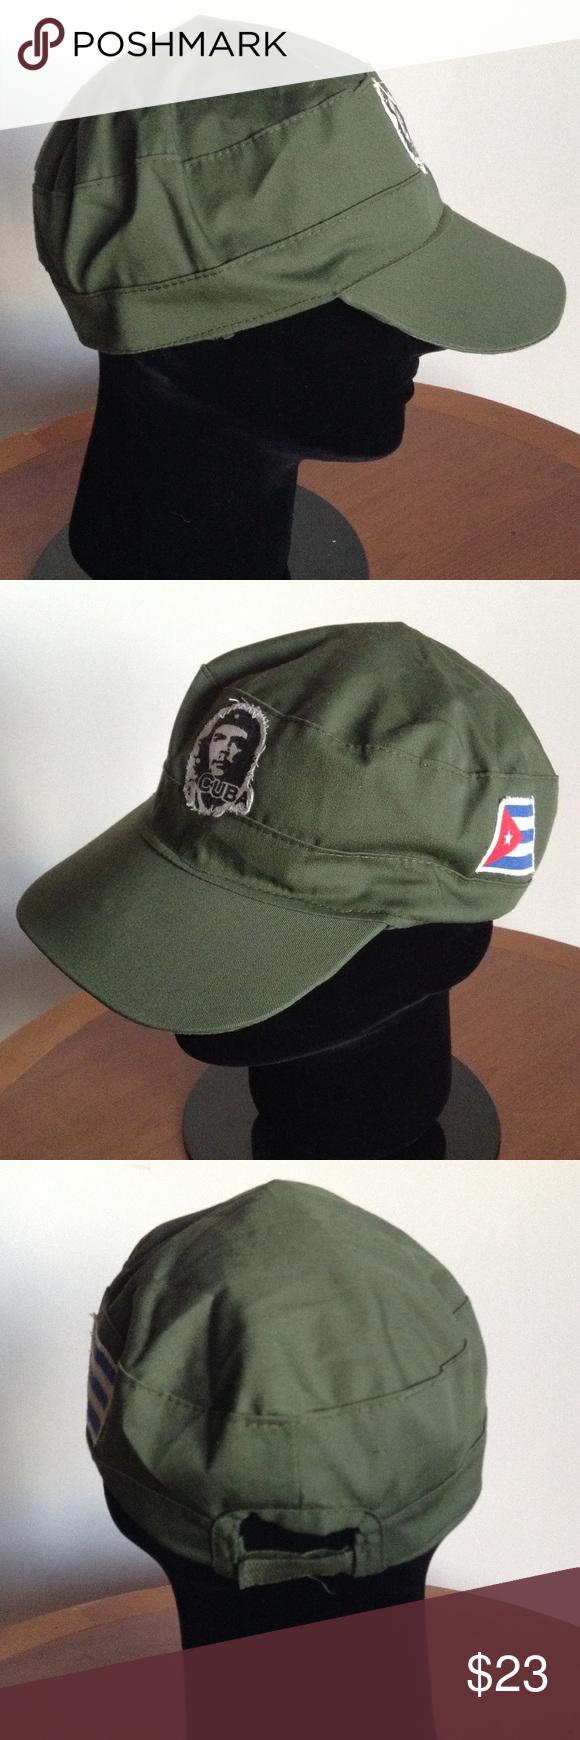 Revolutionary Che Guevara Vintage Cuban Army Hat Clothes Design Vintage Fashion Fashion Design